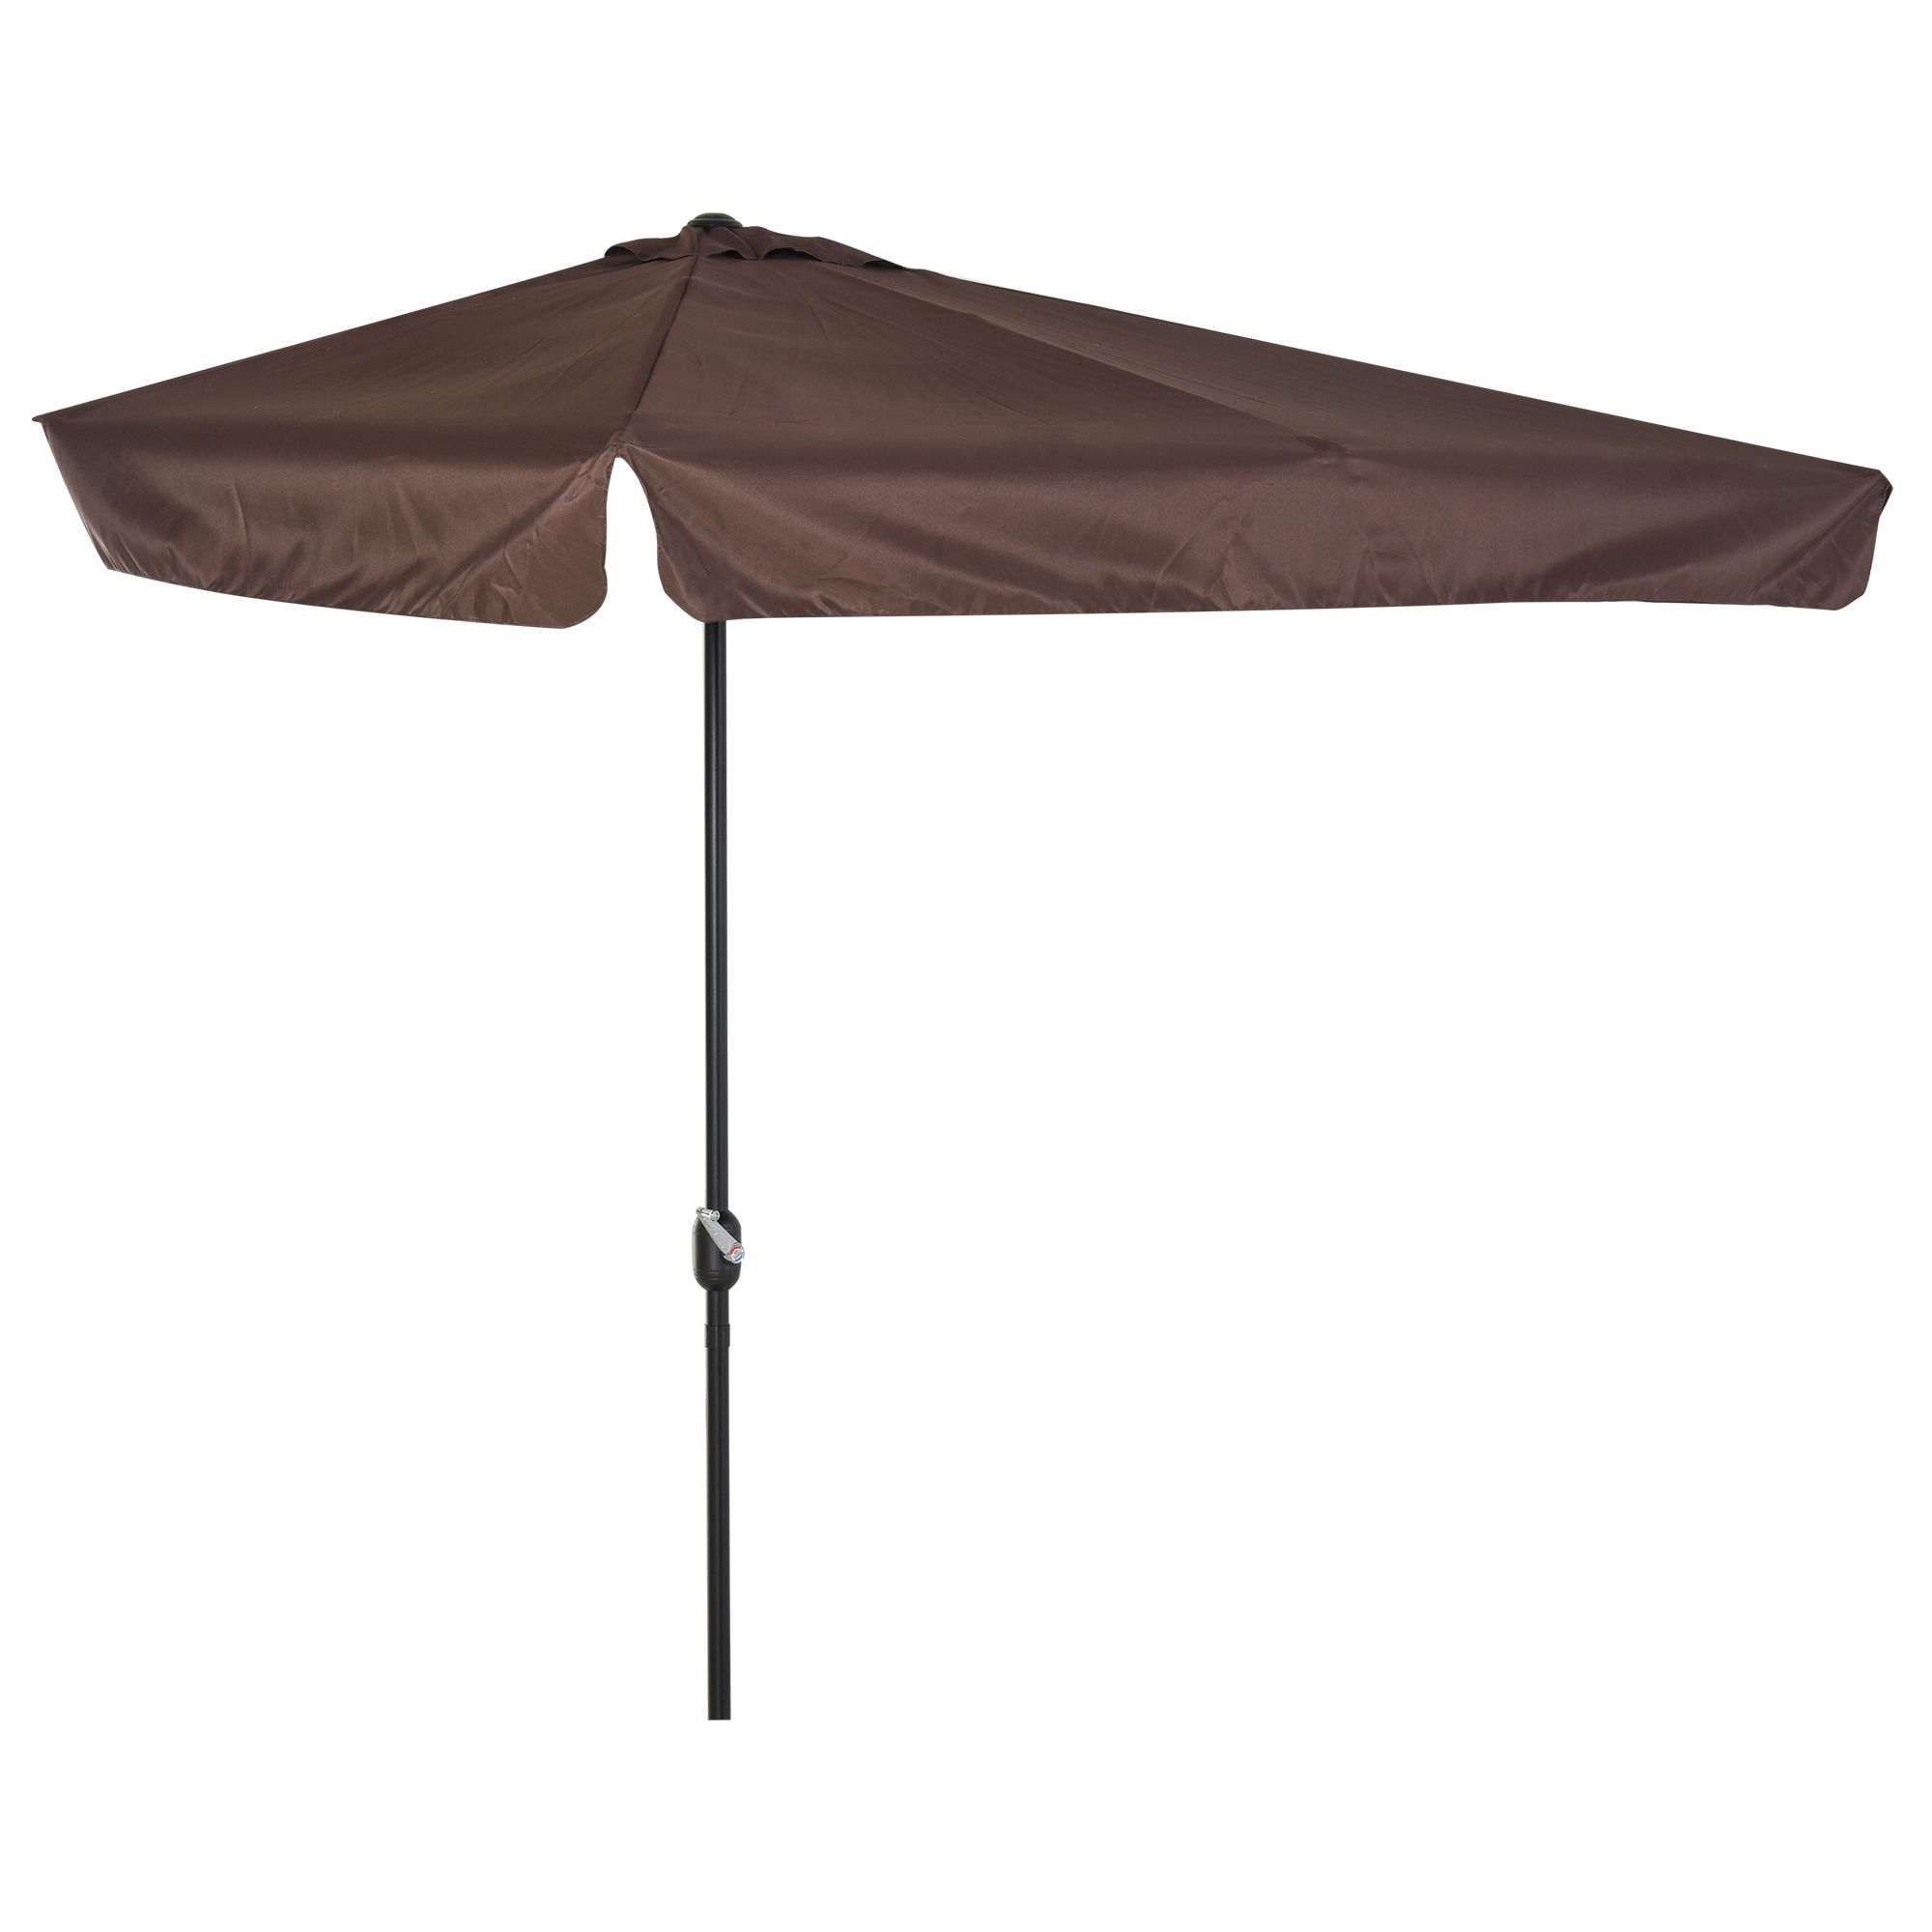 Demi parasol - parasol de balcon chocolat